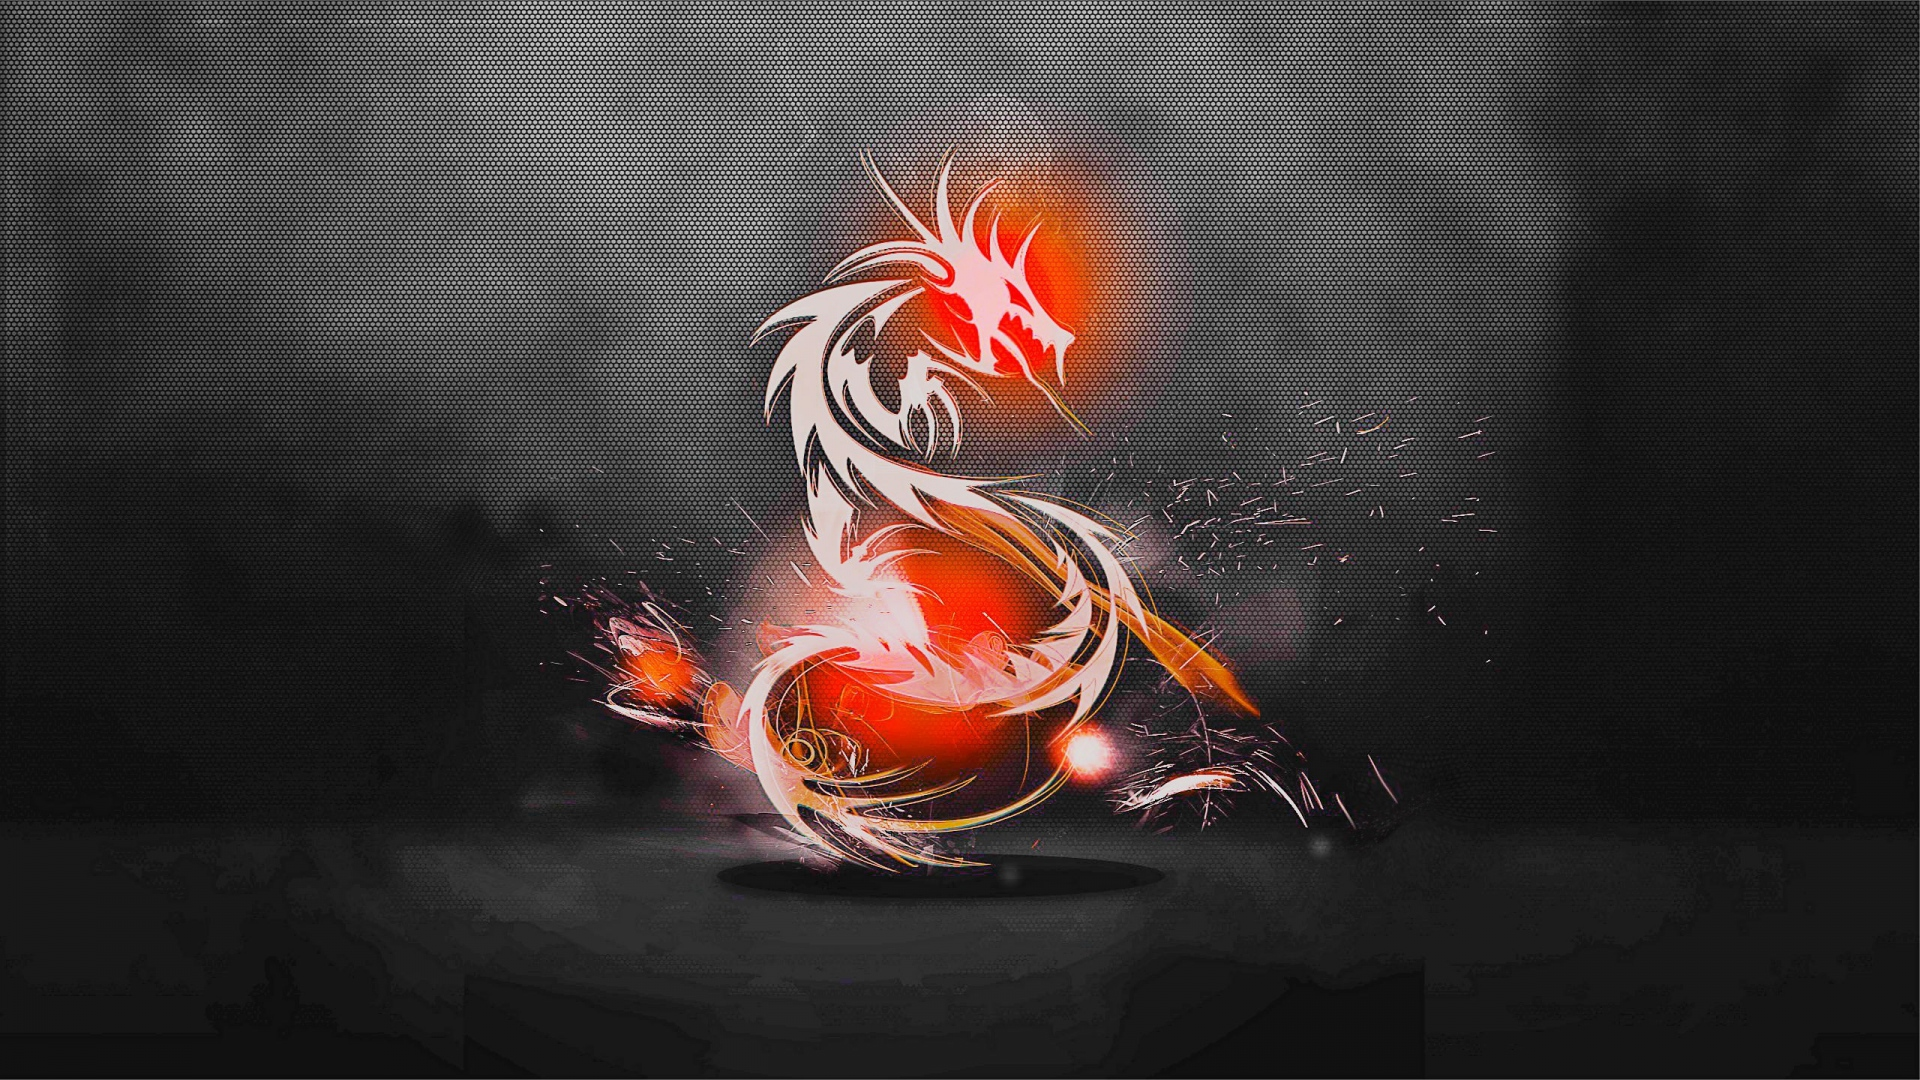 Dragon Wallpapers HD 1920x1080